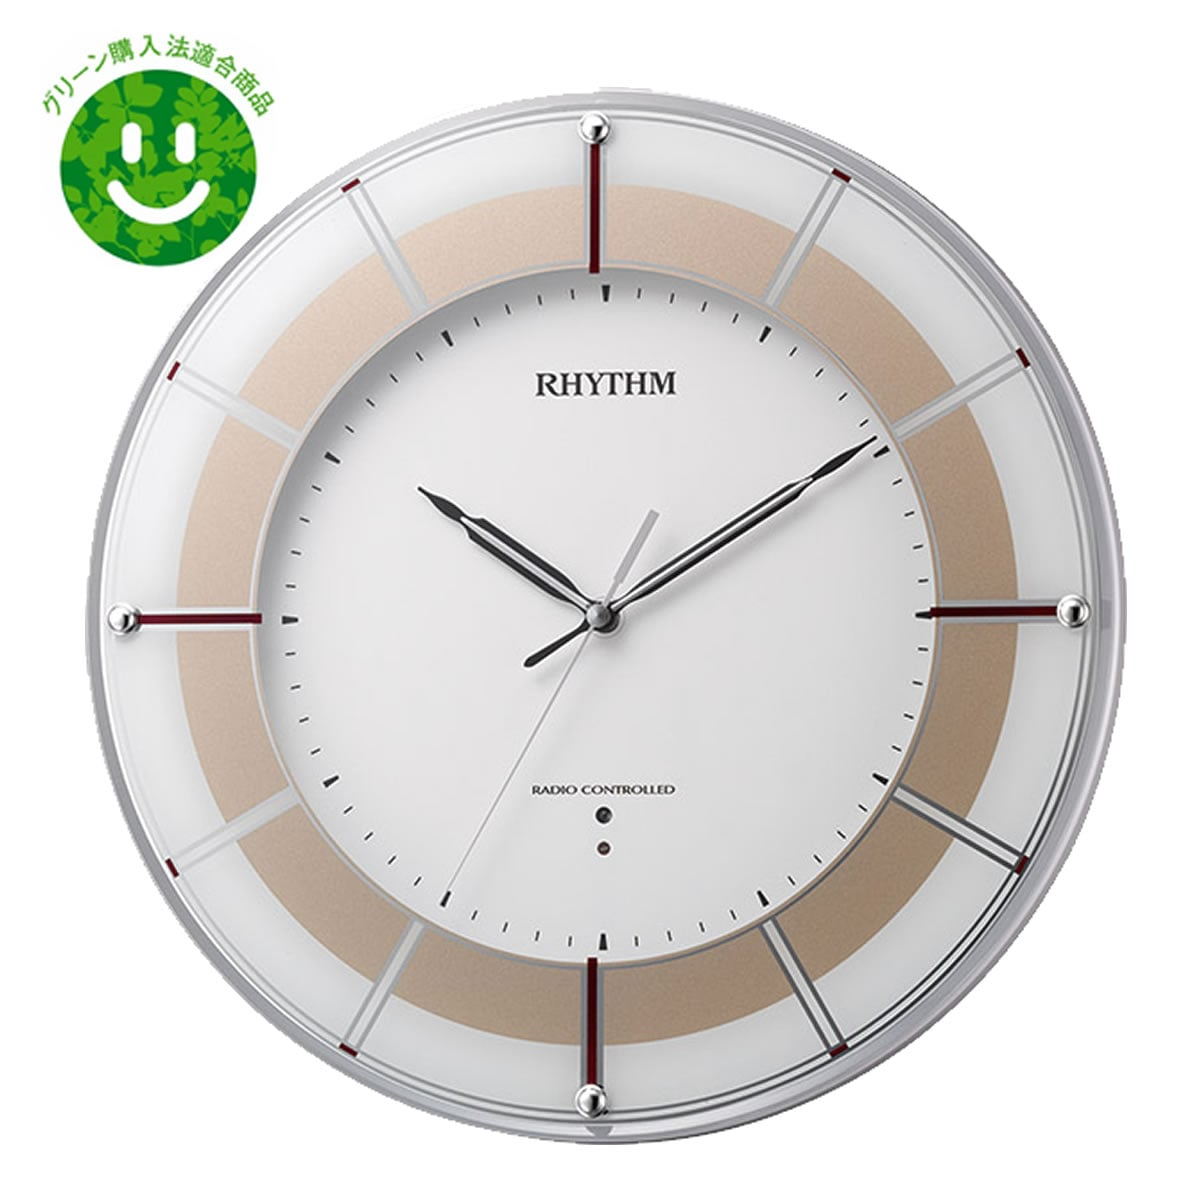 RHYTHM(リズム) 高感度電波掛け時計 スリーウェイブM843 4MY843SR18